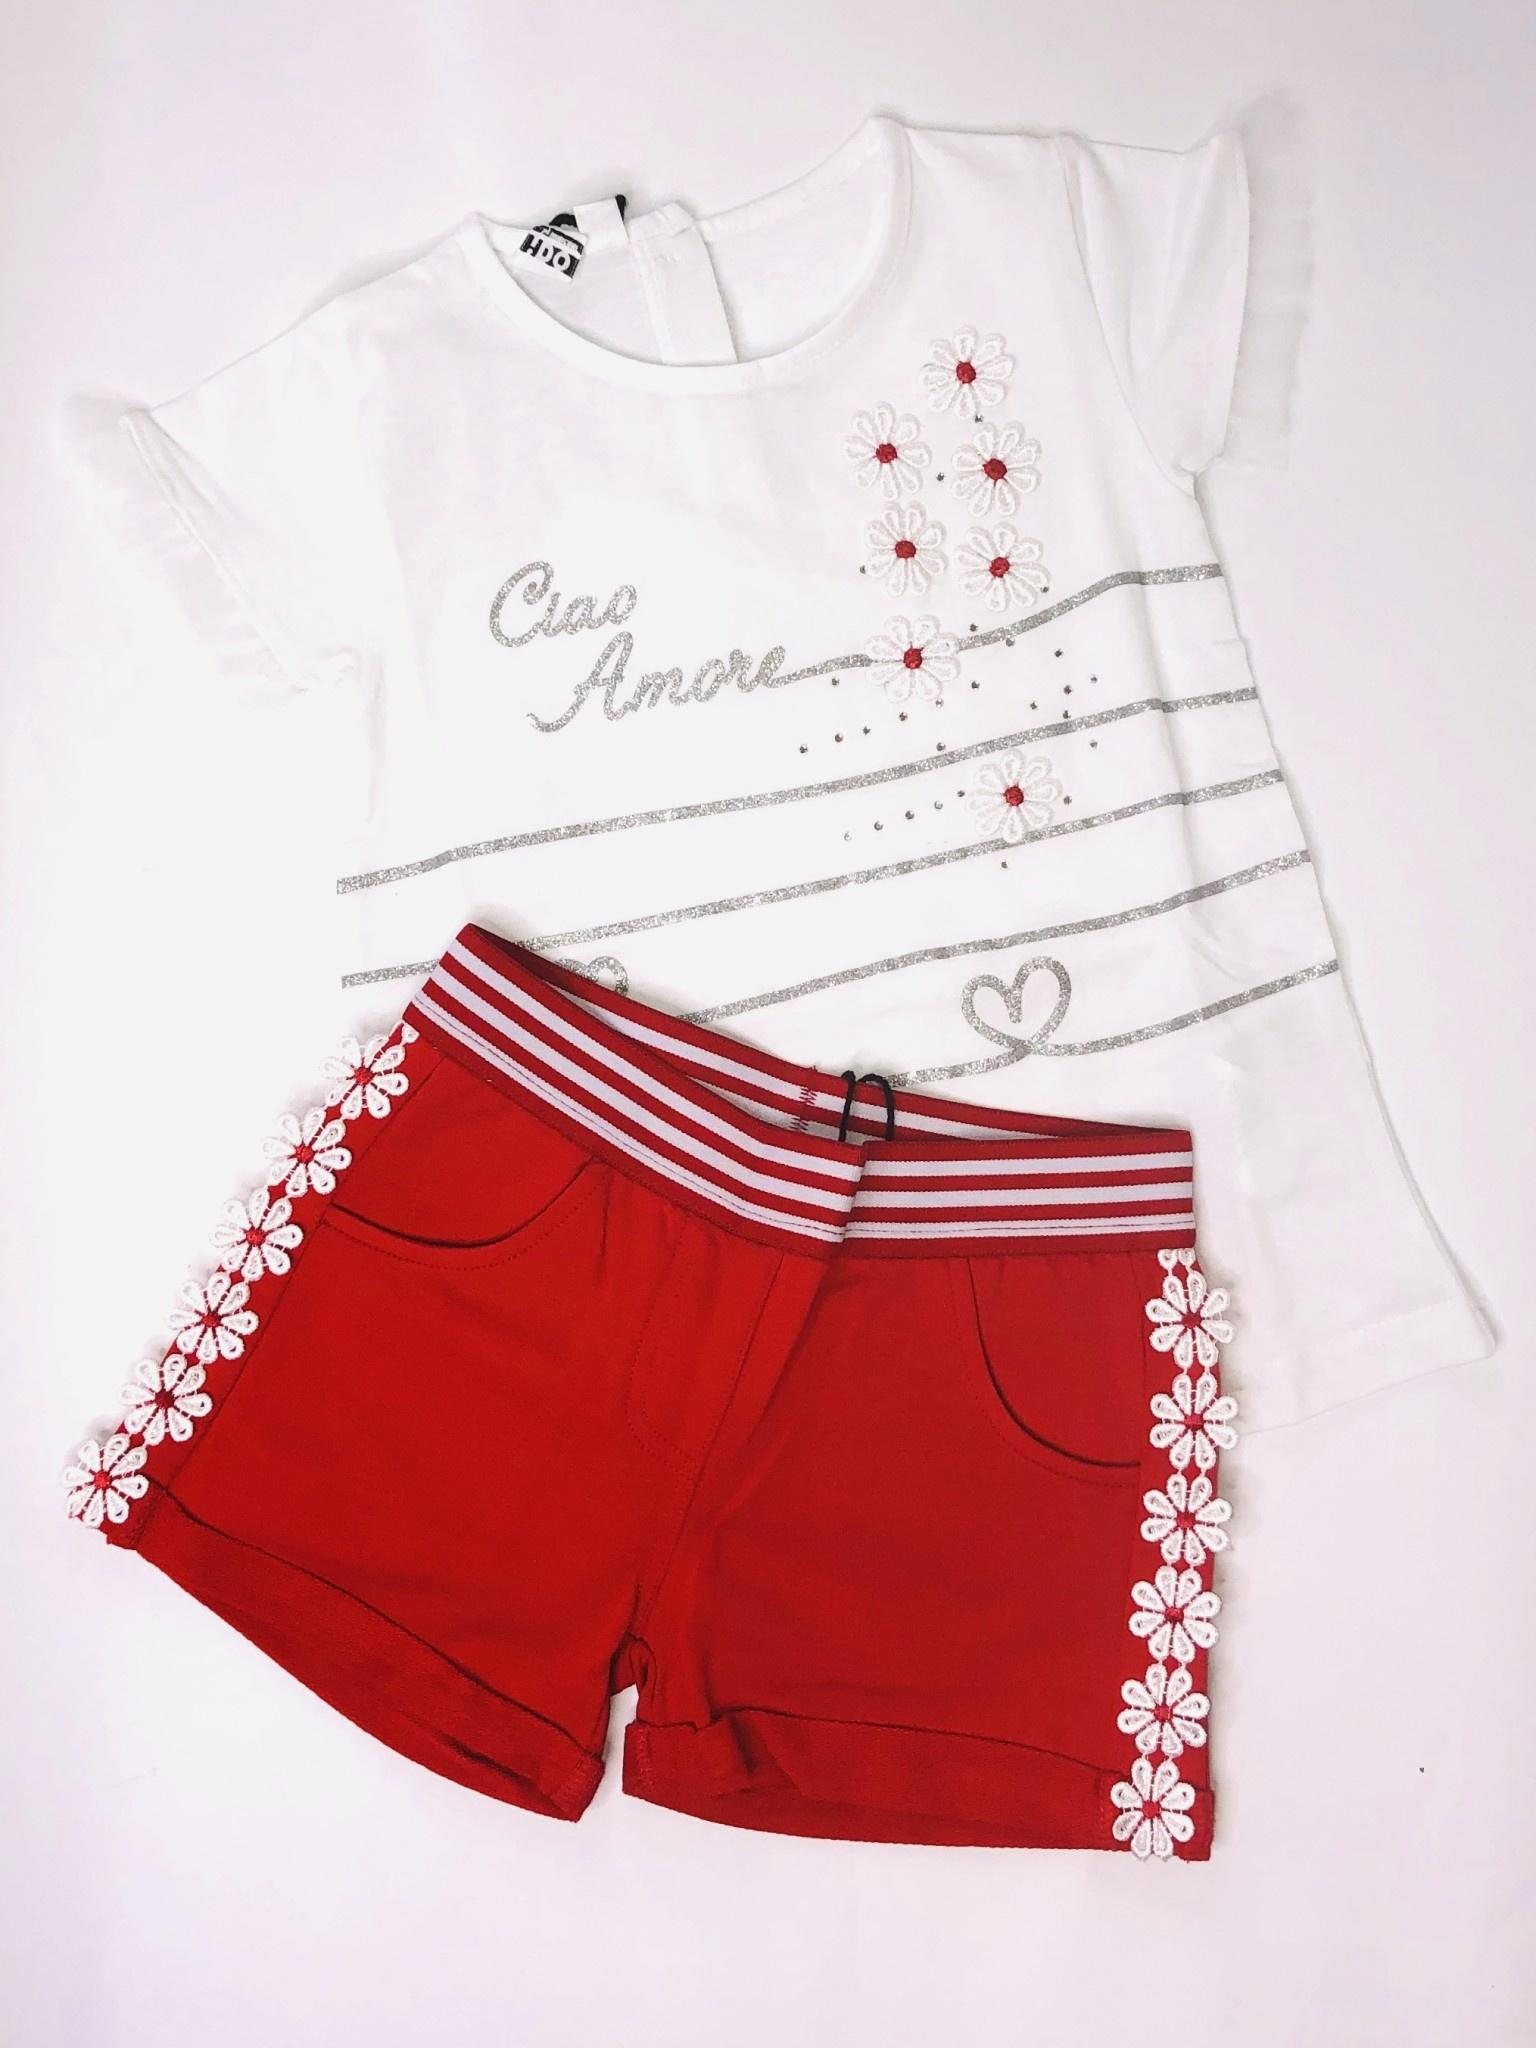 Ido Ido J758 Red & White Daisy Amour Top & Short Set